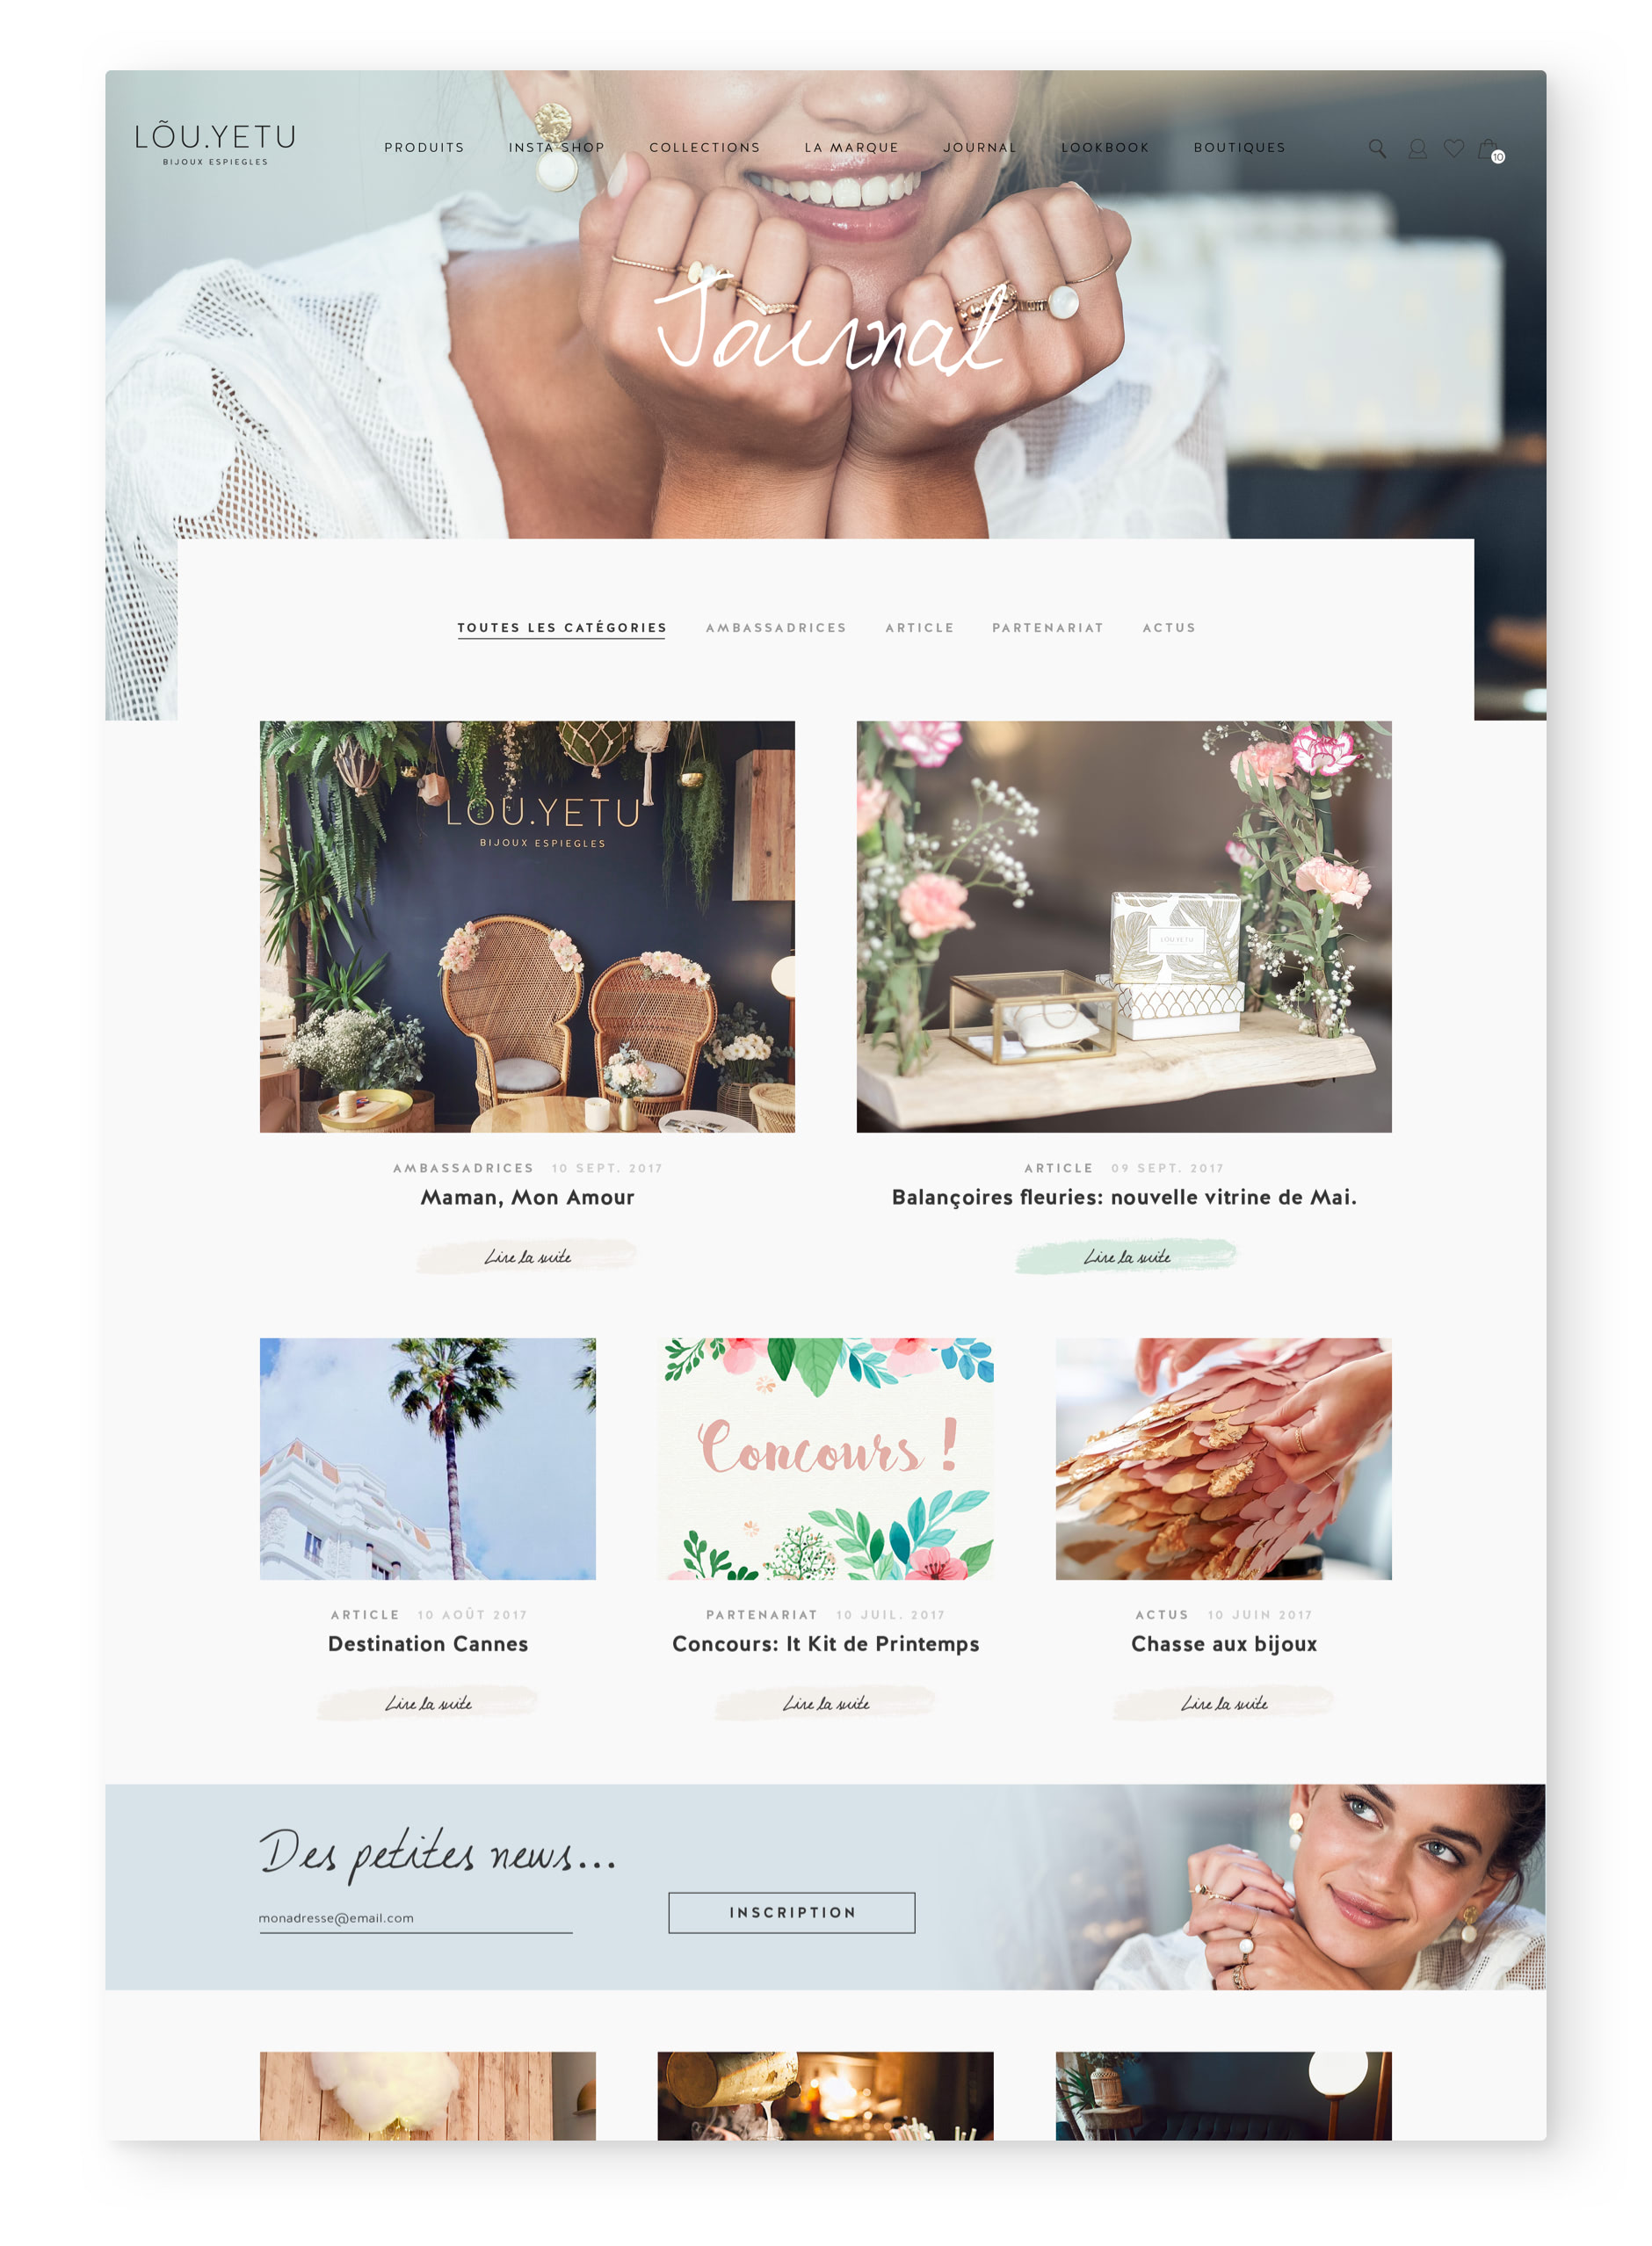 projet-lou_yetu-bijoux-website_design-robin_p_06@2x